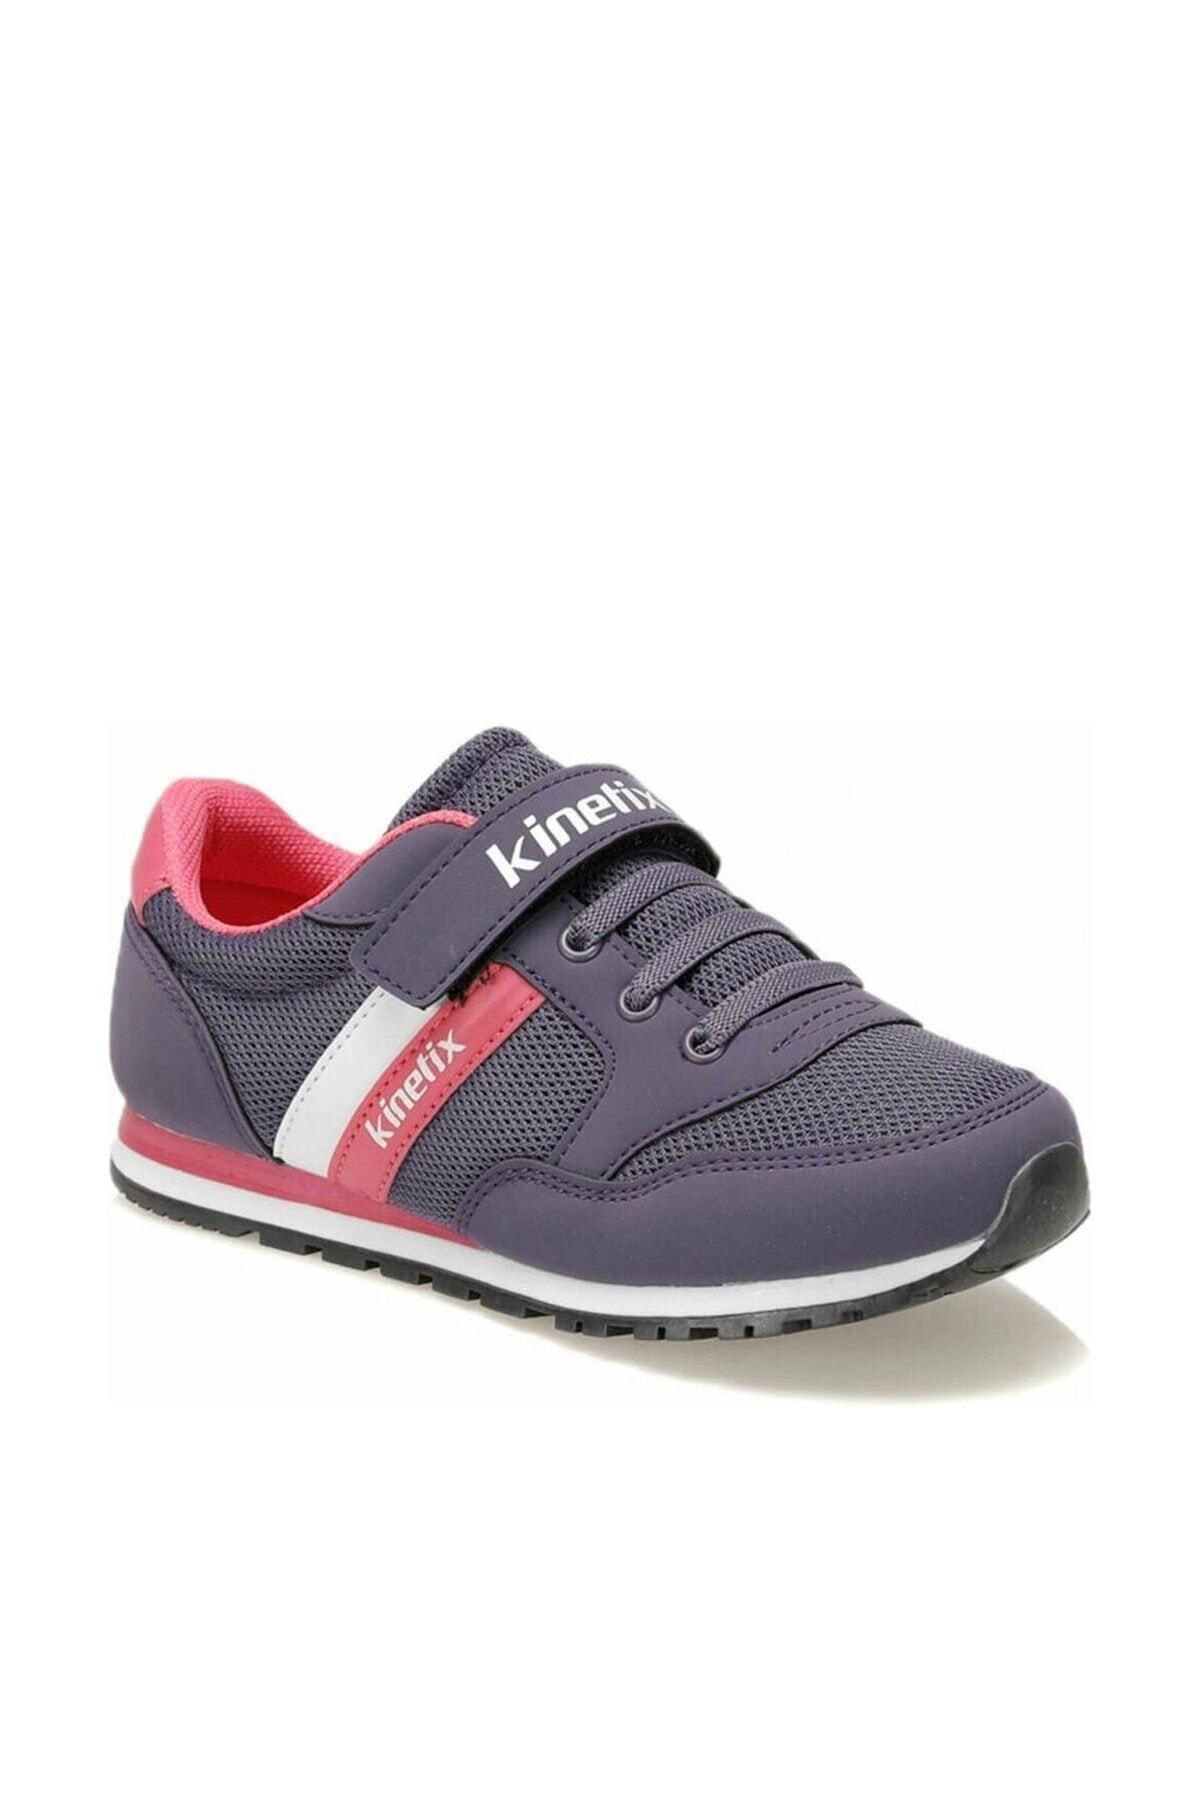 Kinetix PAYOF Mor Fuşya Beyaz Kız Çocuk Sneaker 100294193 1